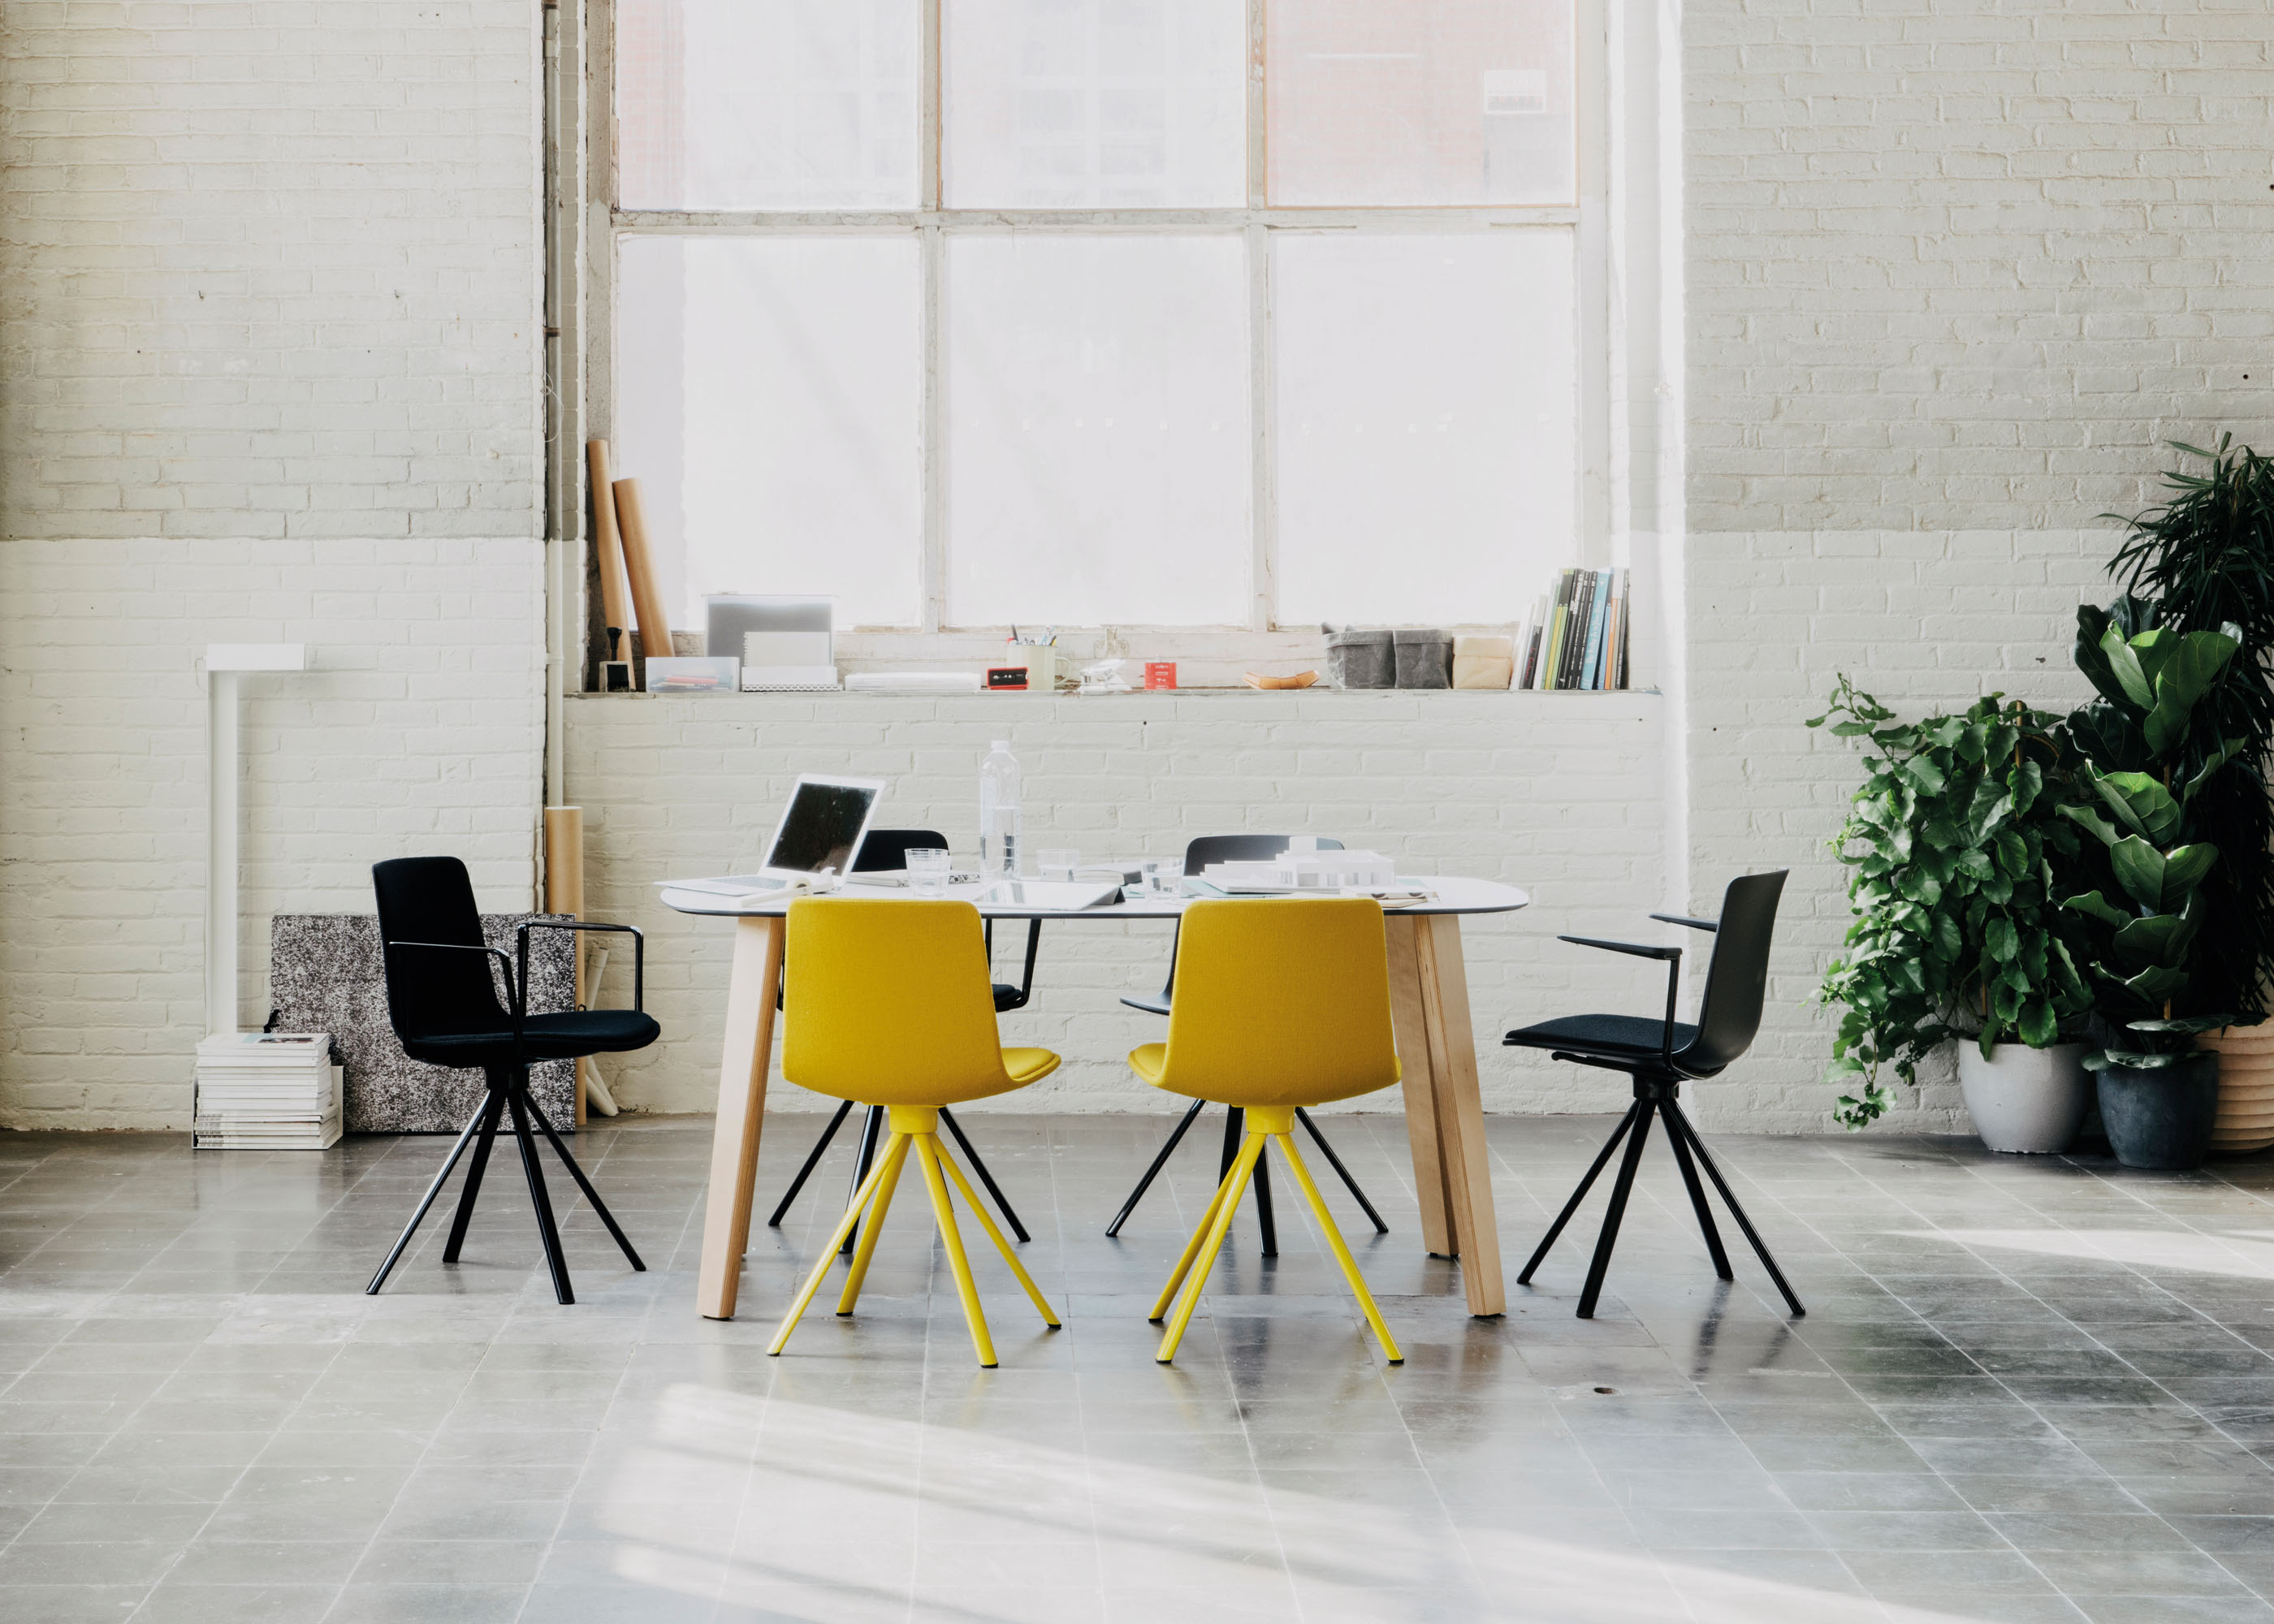 #furniture #enea #design #clase #interiors #workspace #studios